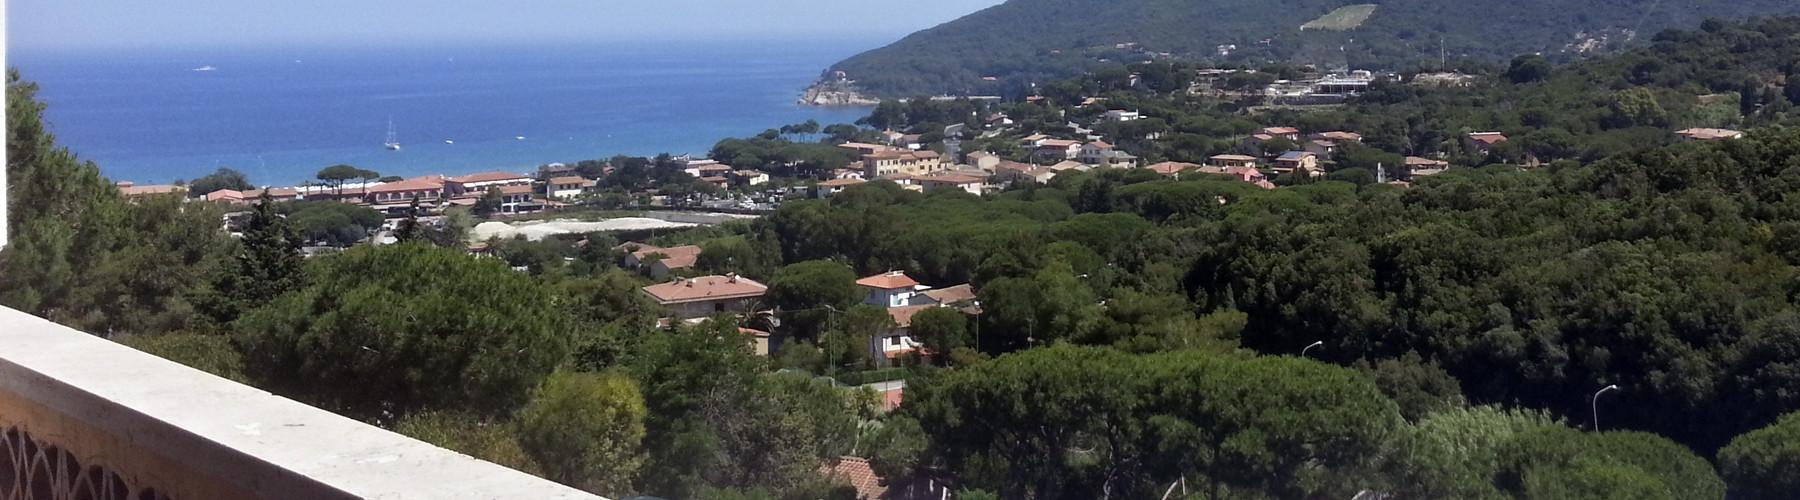 Residence-napoleon-4-1800x500